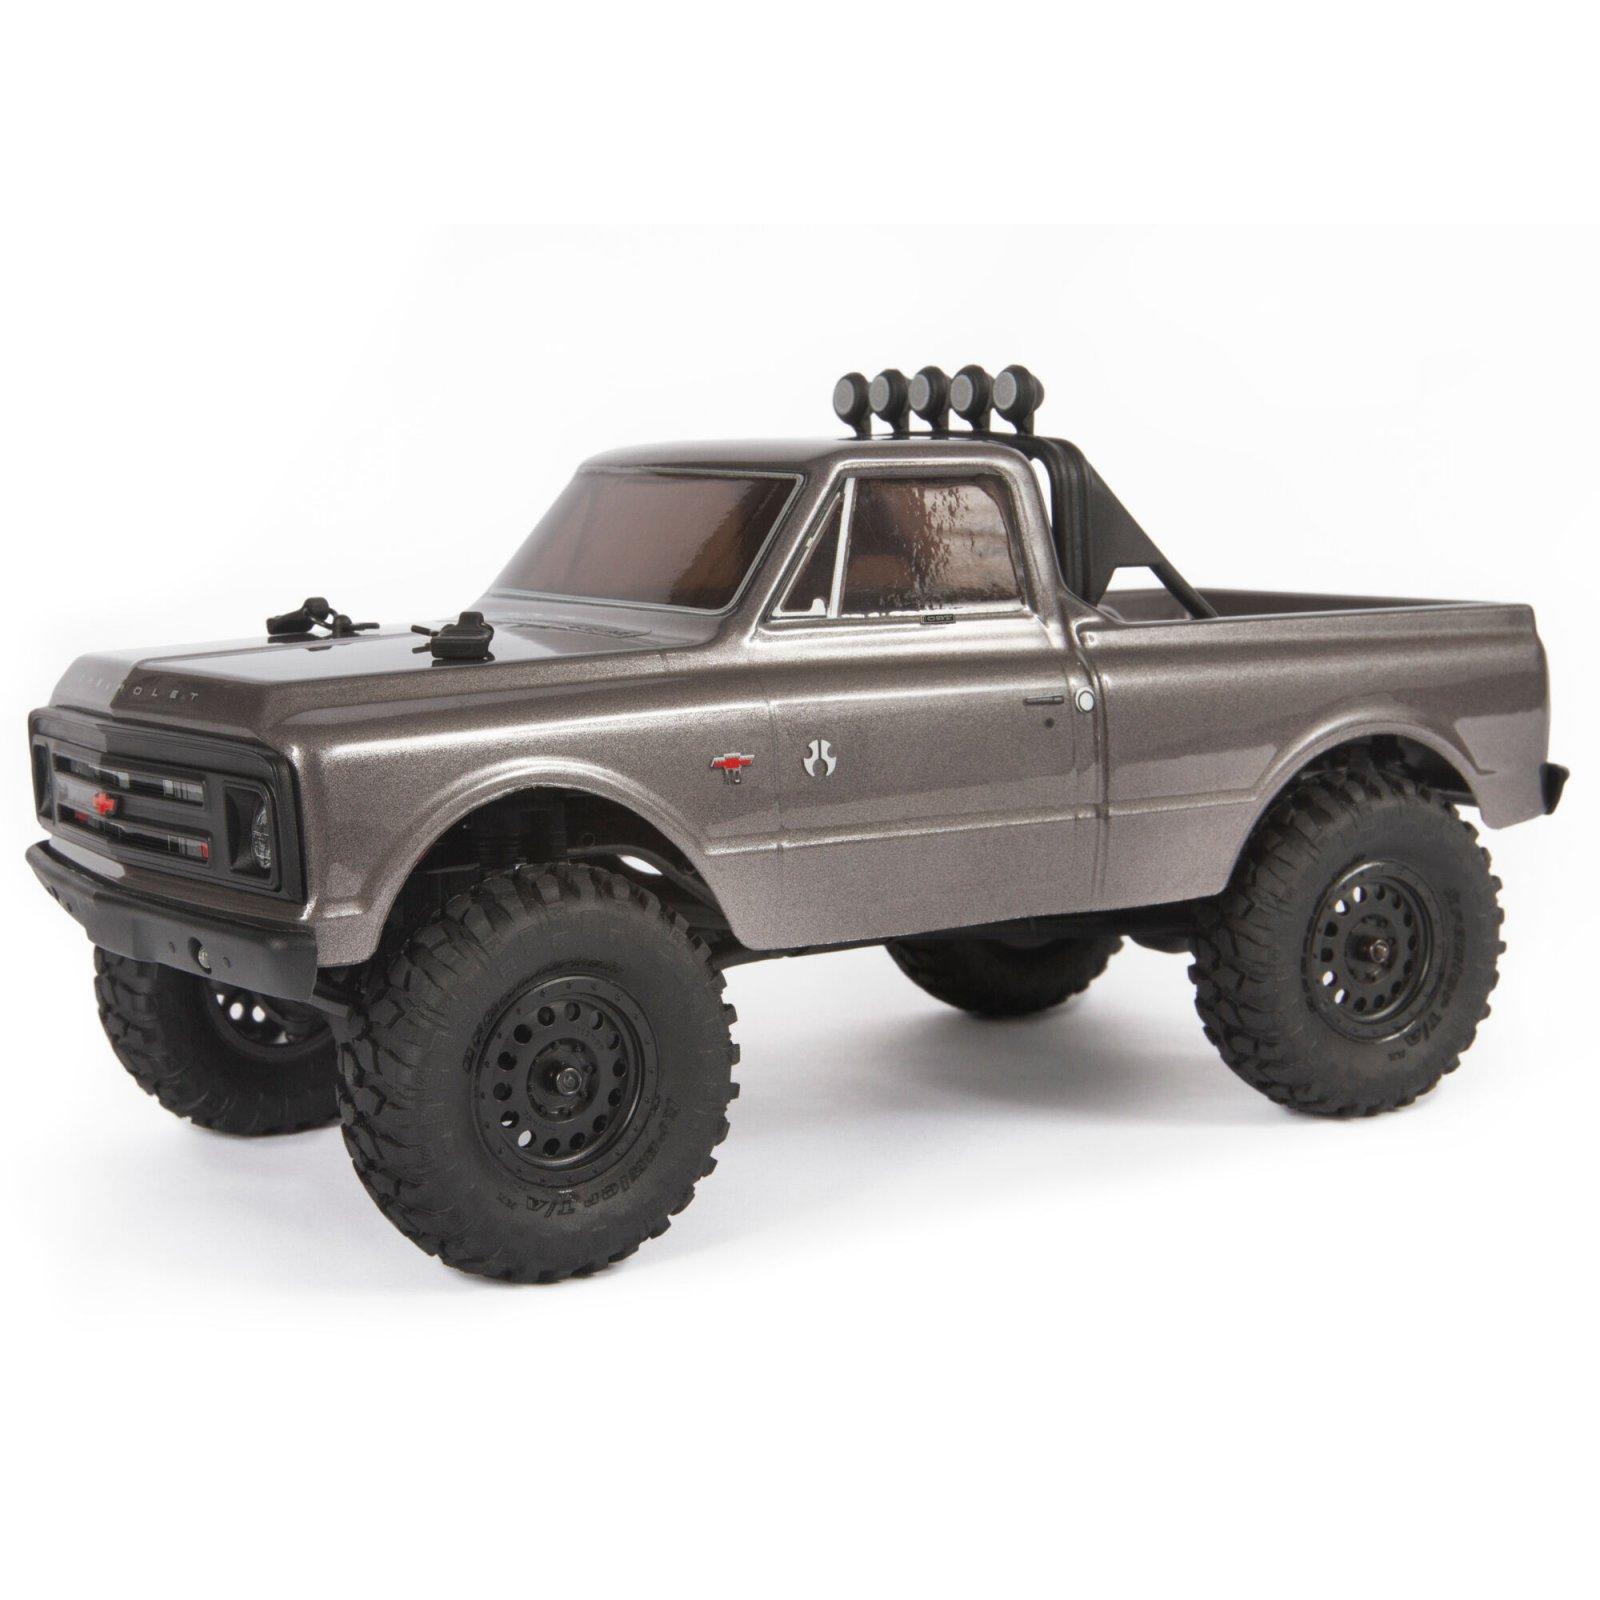 1/24 SCX24 1967 Chevrolet C10 4WD Truck Brushed RTR, Dark Silver